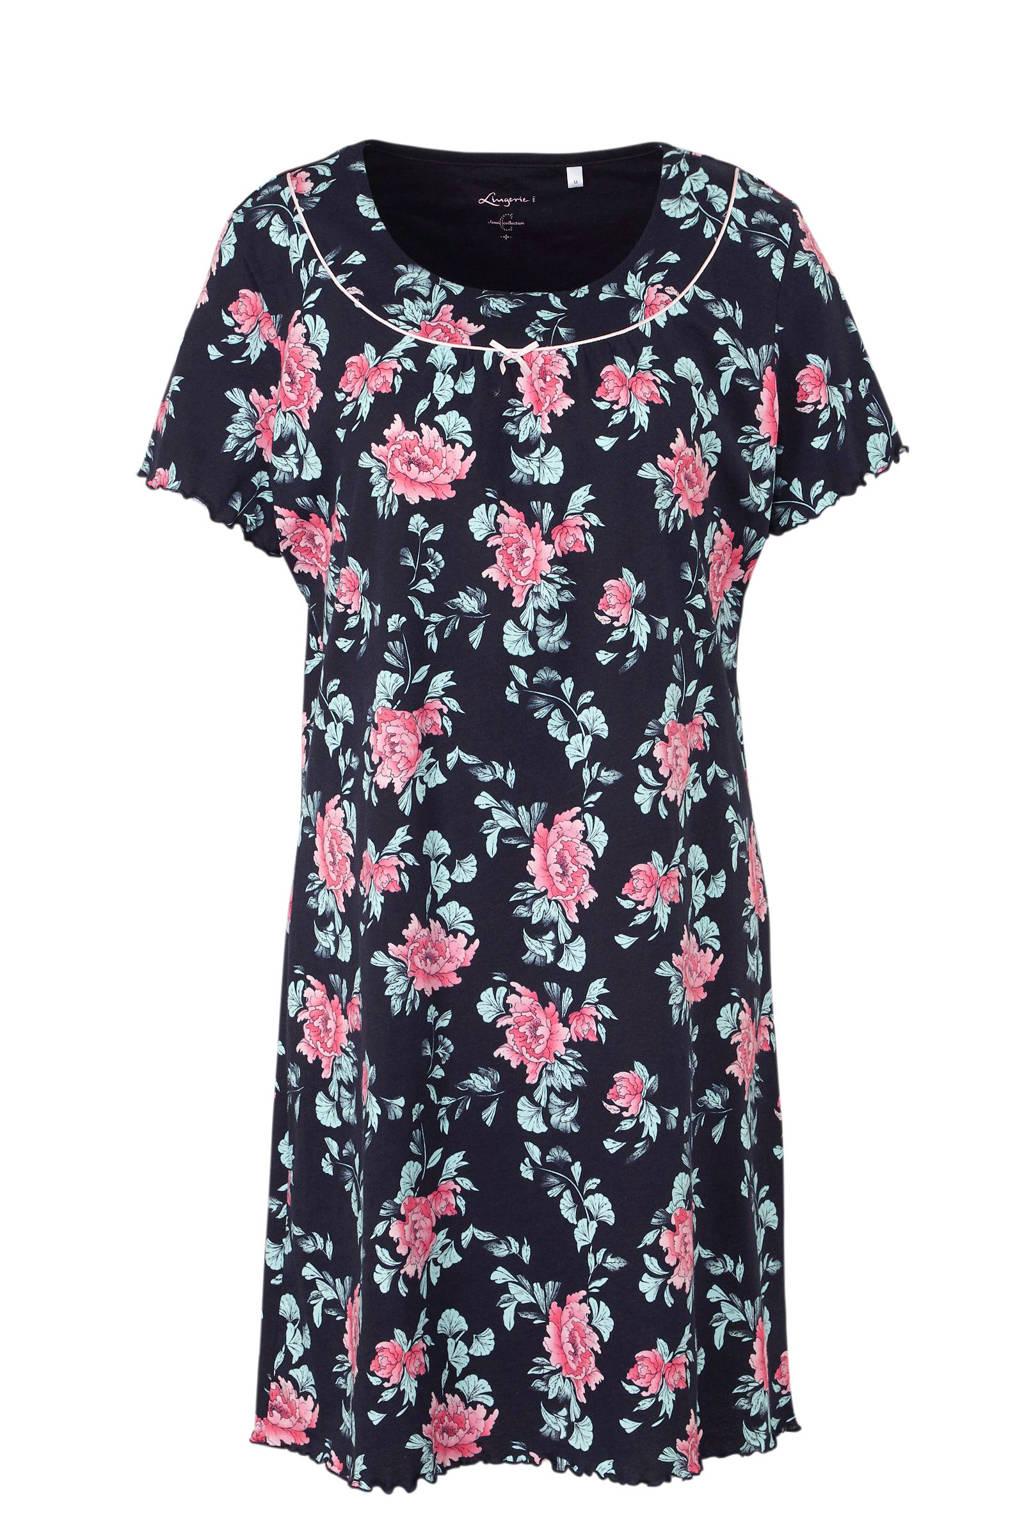 C&A nachthemd met all over bloemenprint marine, Marine/roze